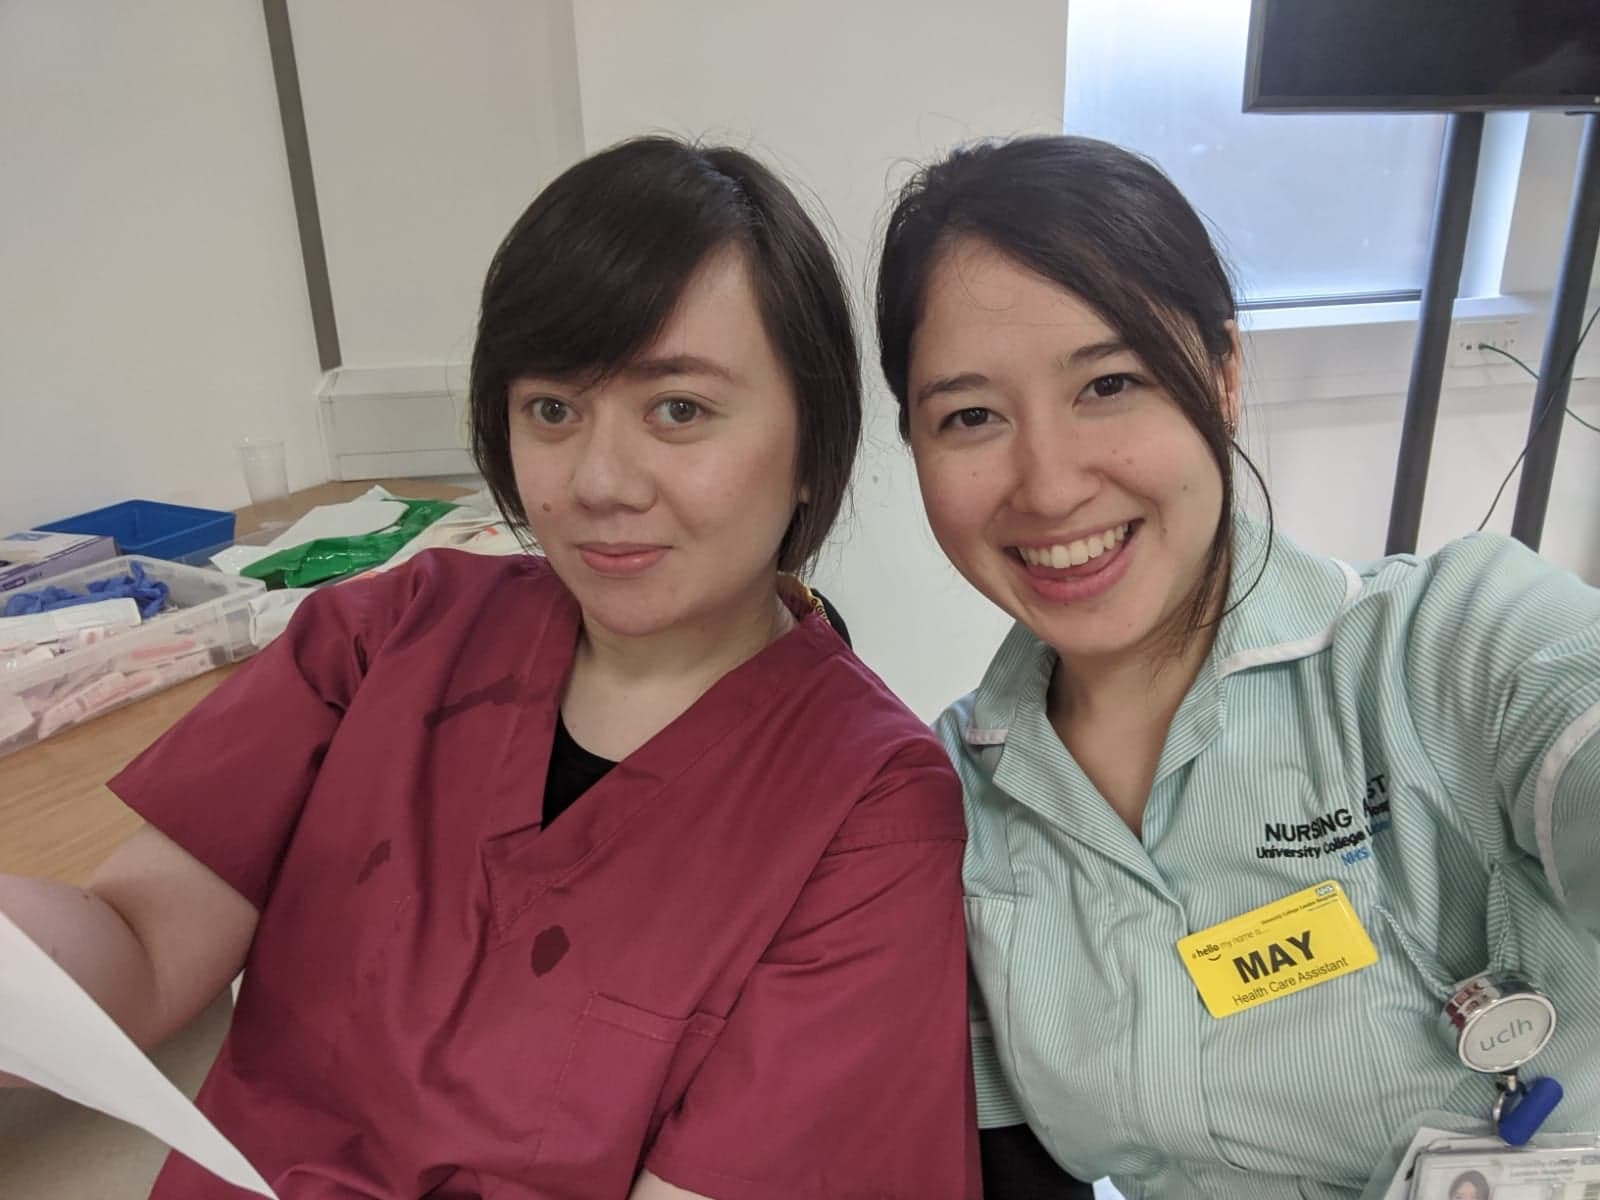 Japanese Healthcare Culture Nurses in the UK